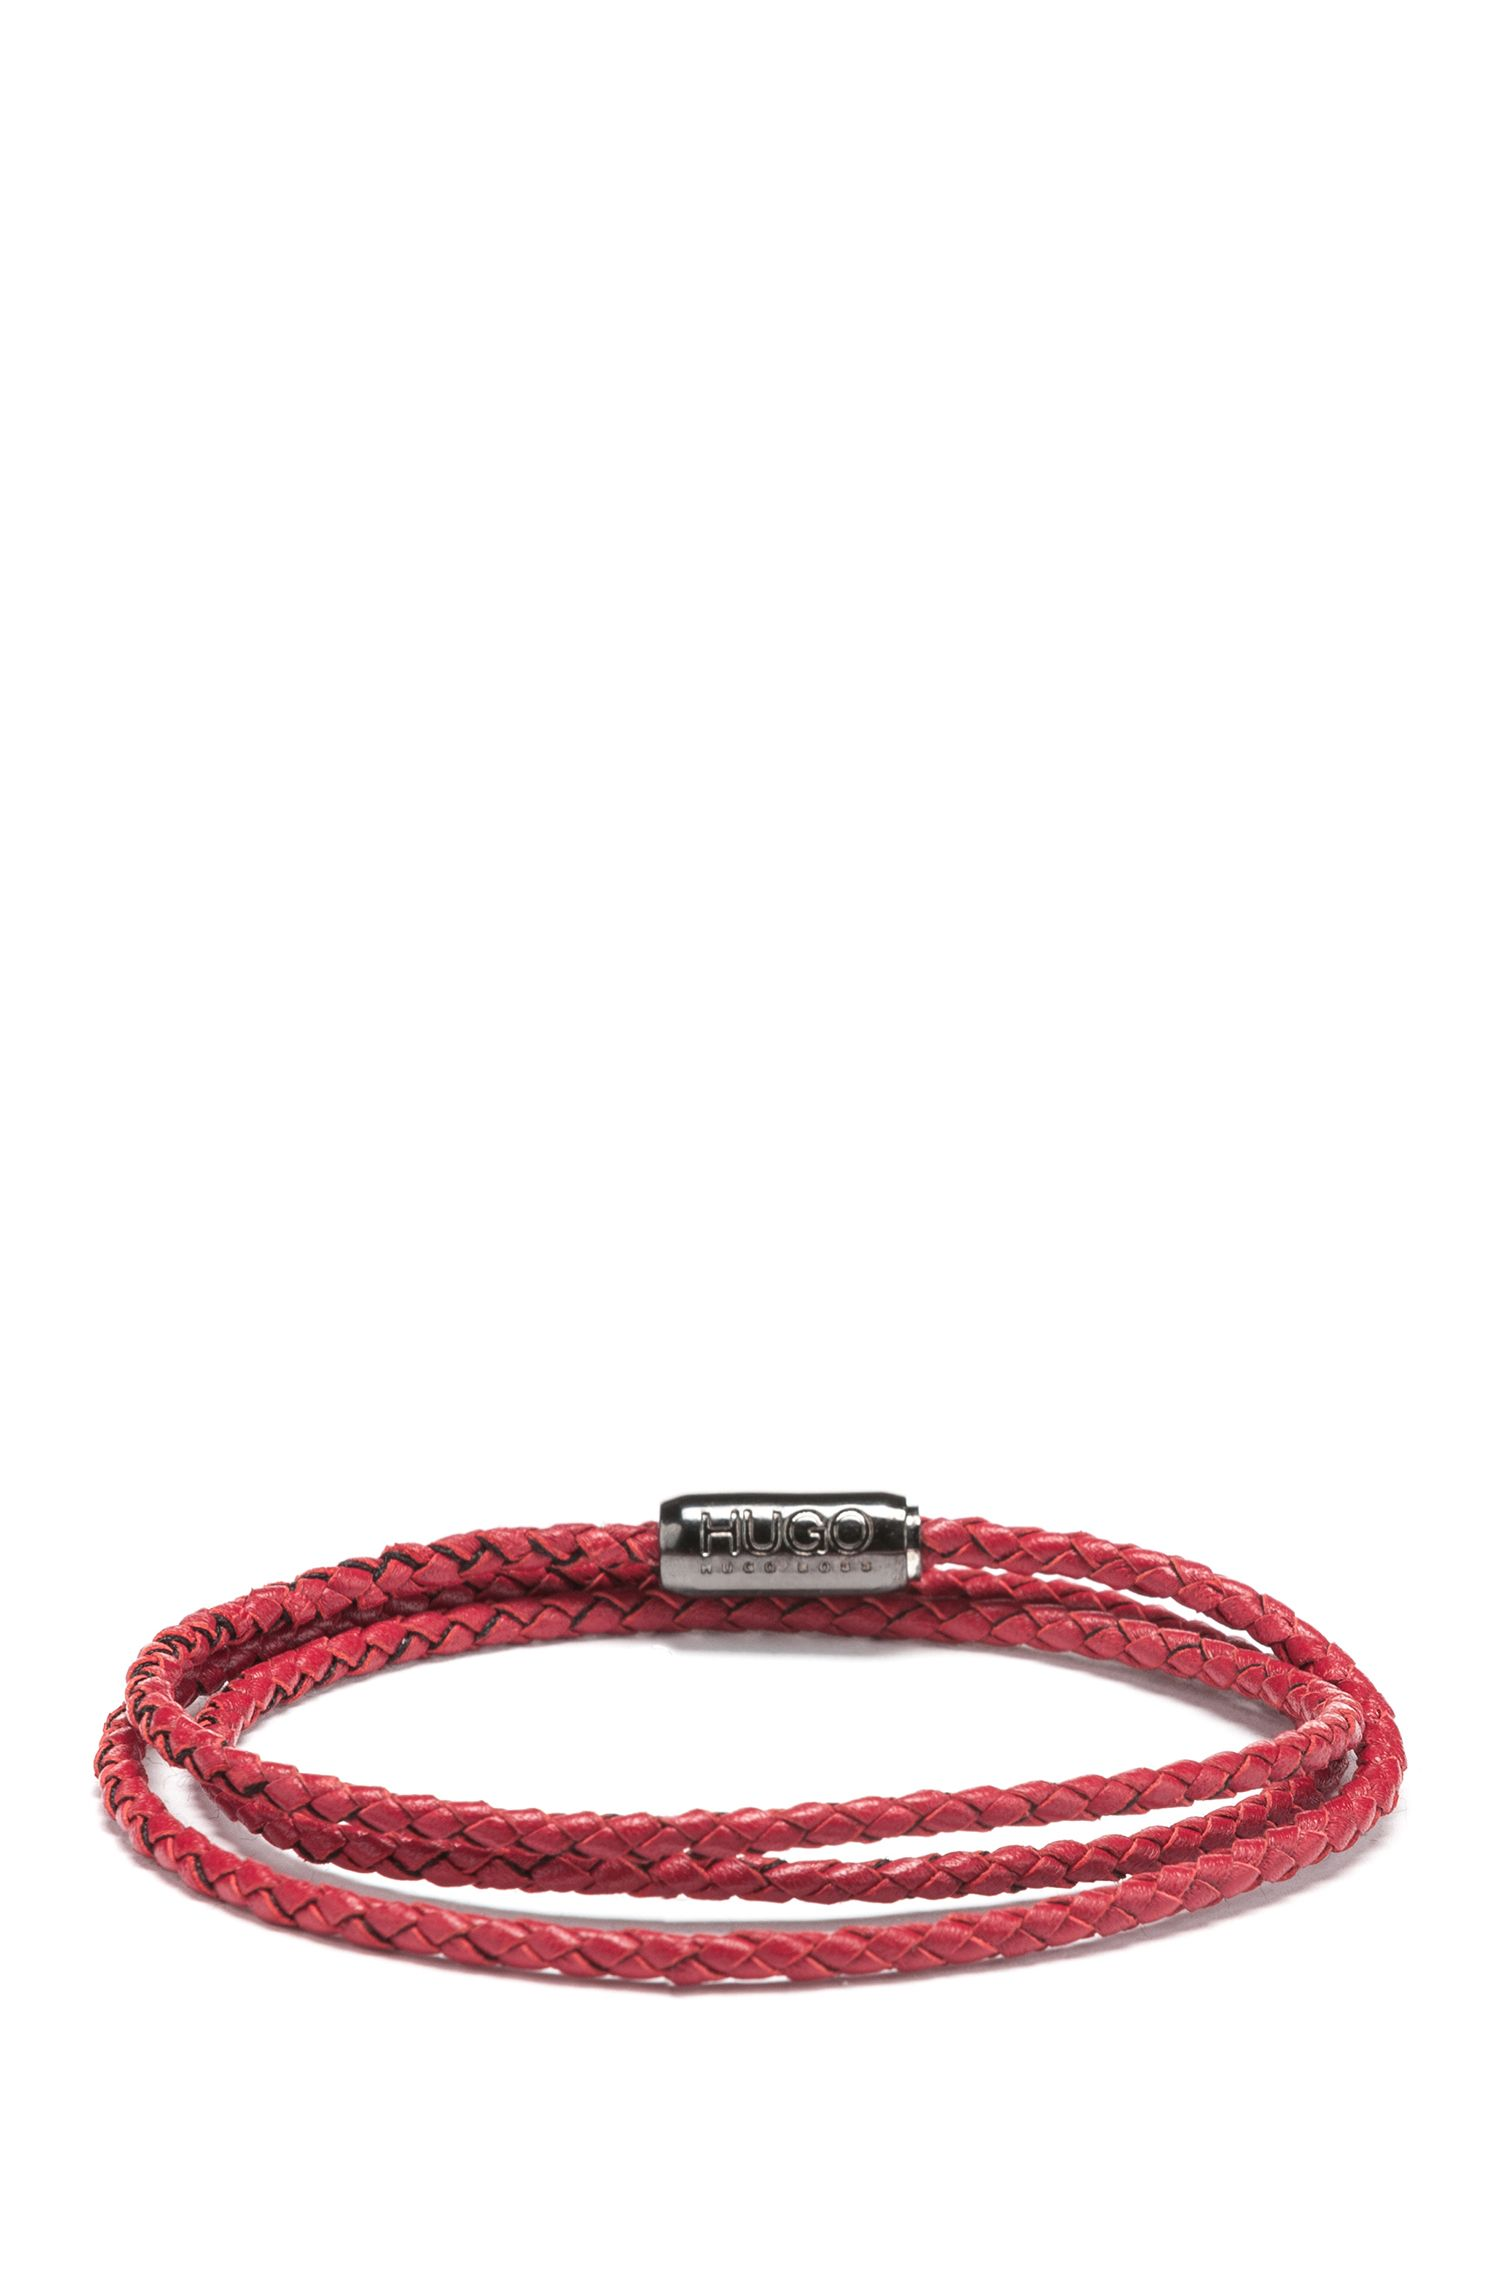 Hugo Boss - Geflochtenes Wickelarmband aus italienischem Leder - 1